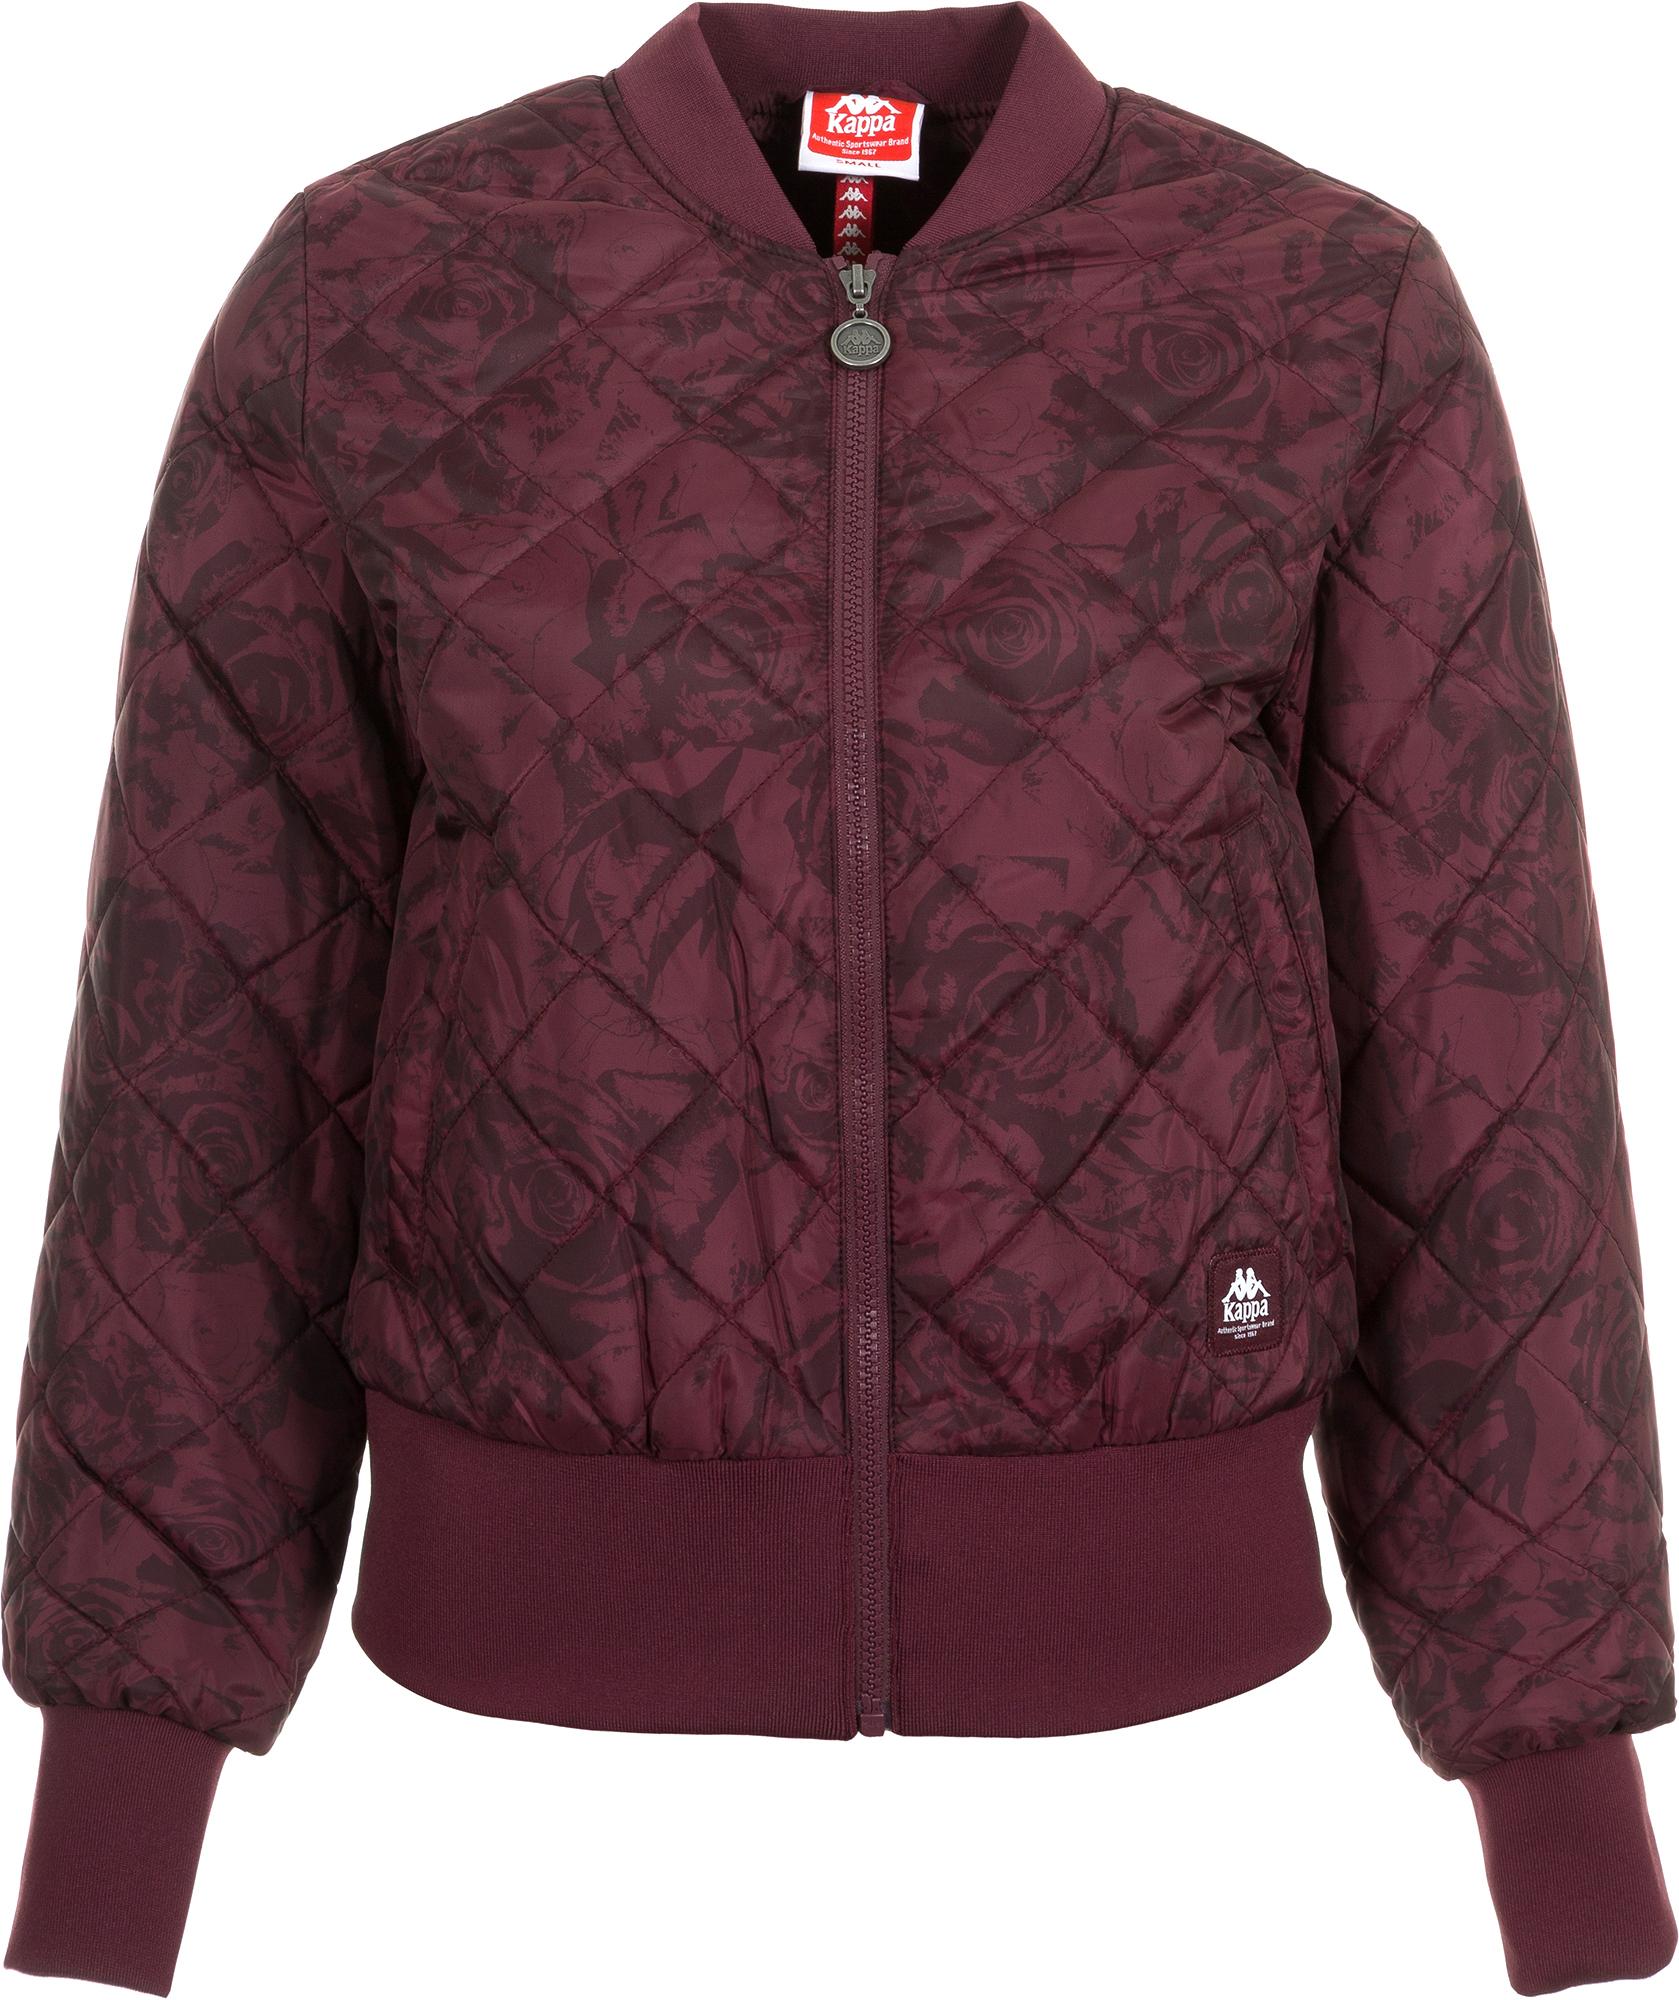 Kappa Куртка утепленная женская Kappa, размер 50